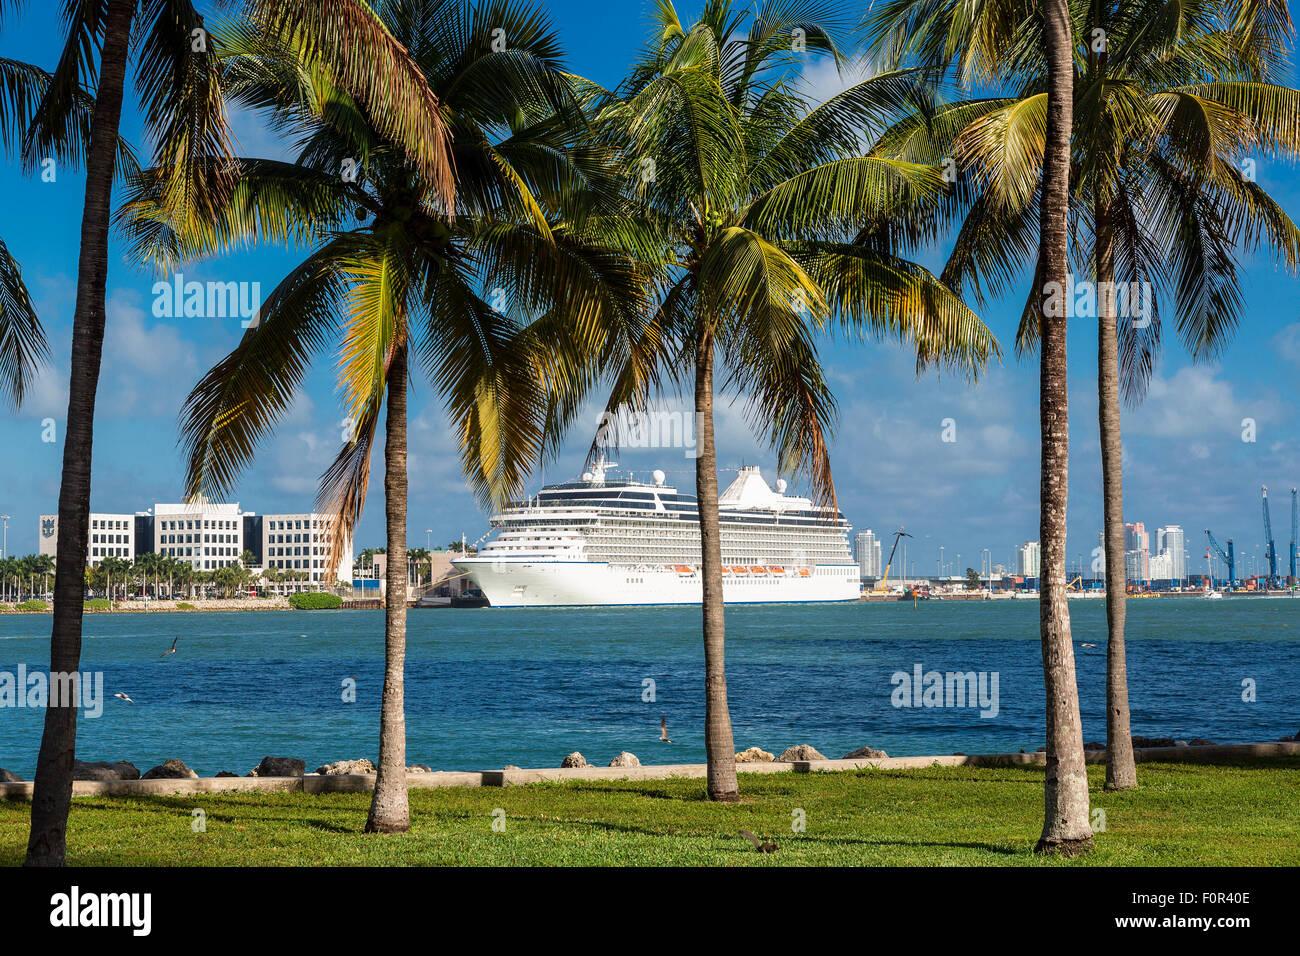 Cruise ship at Miami - Stock Image